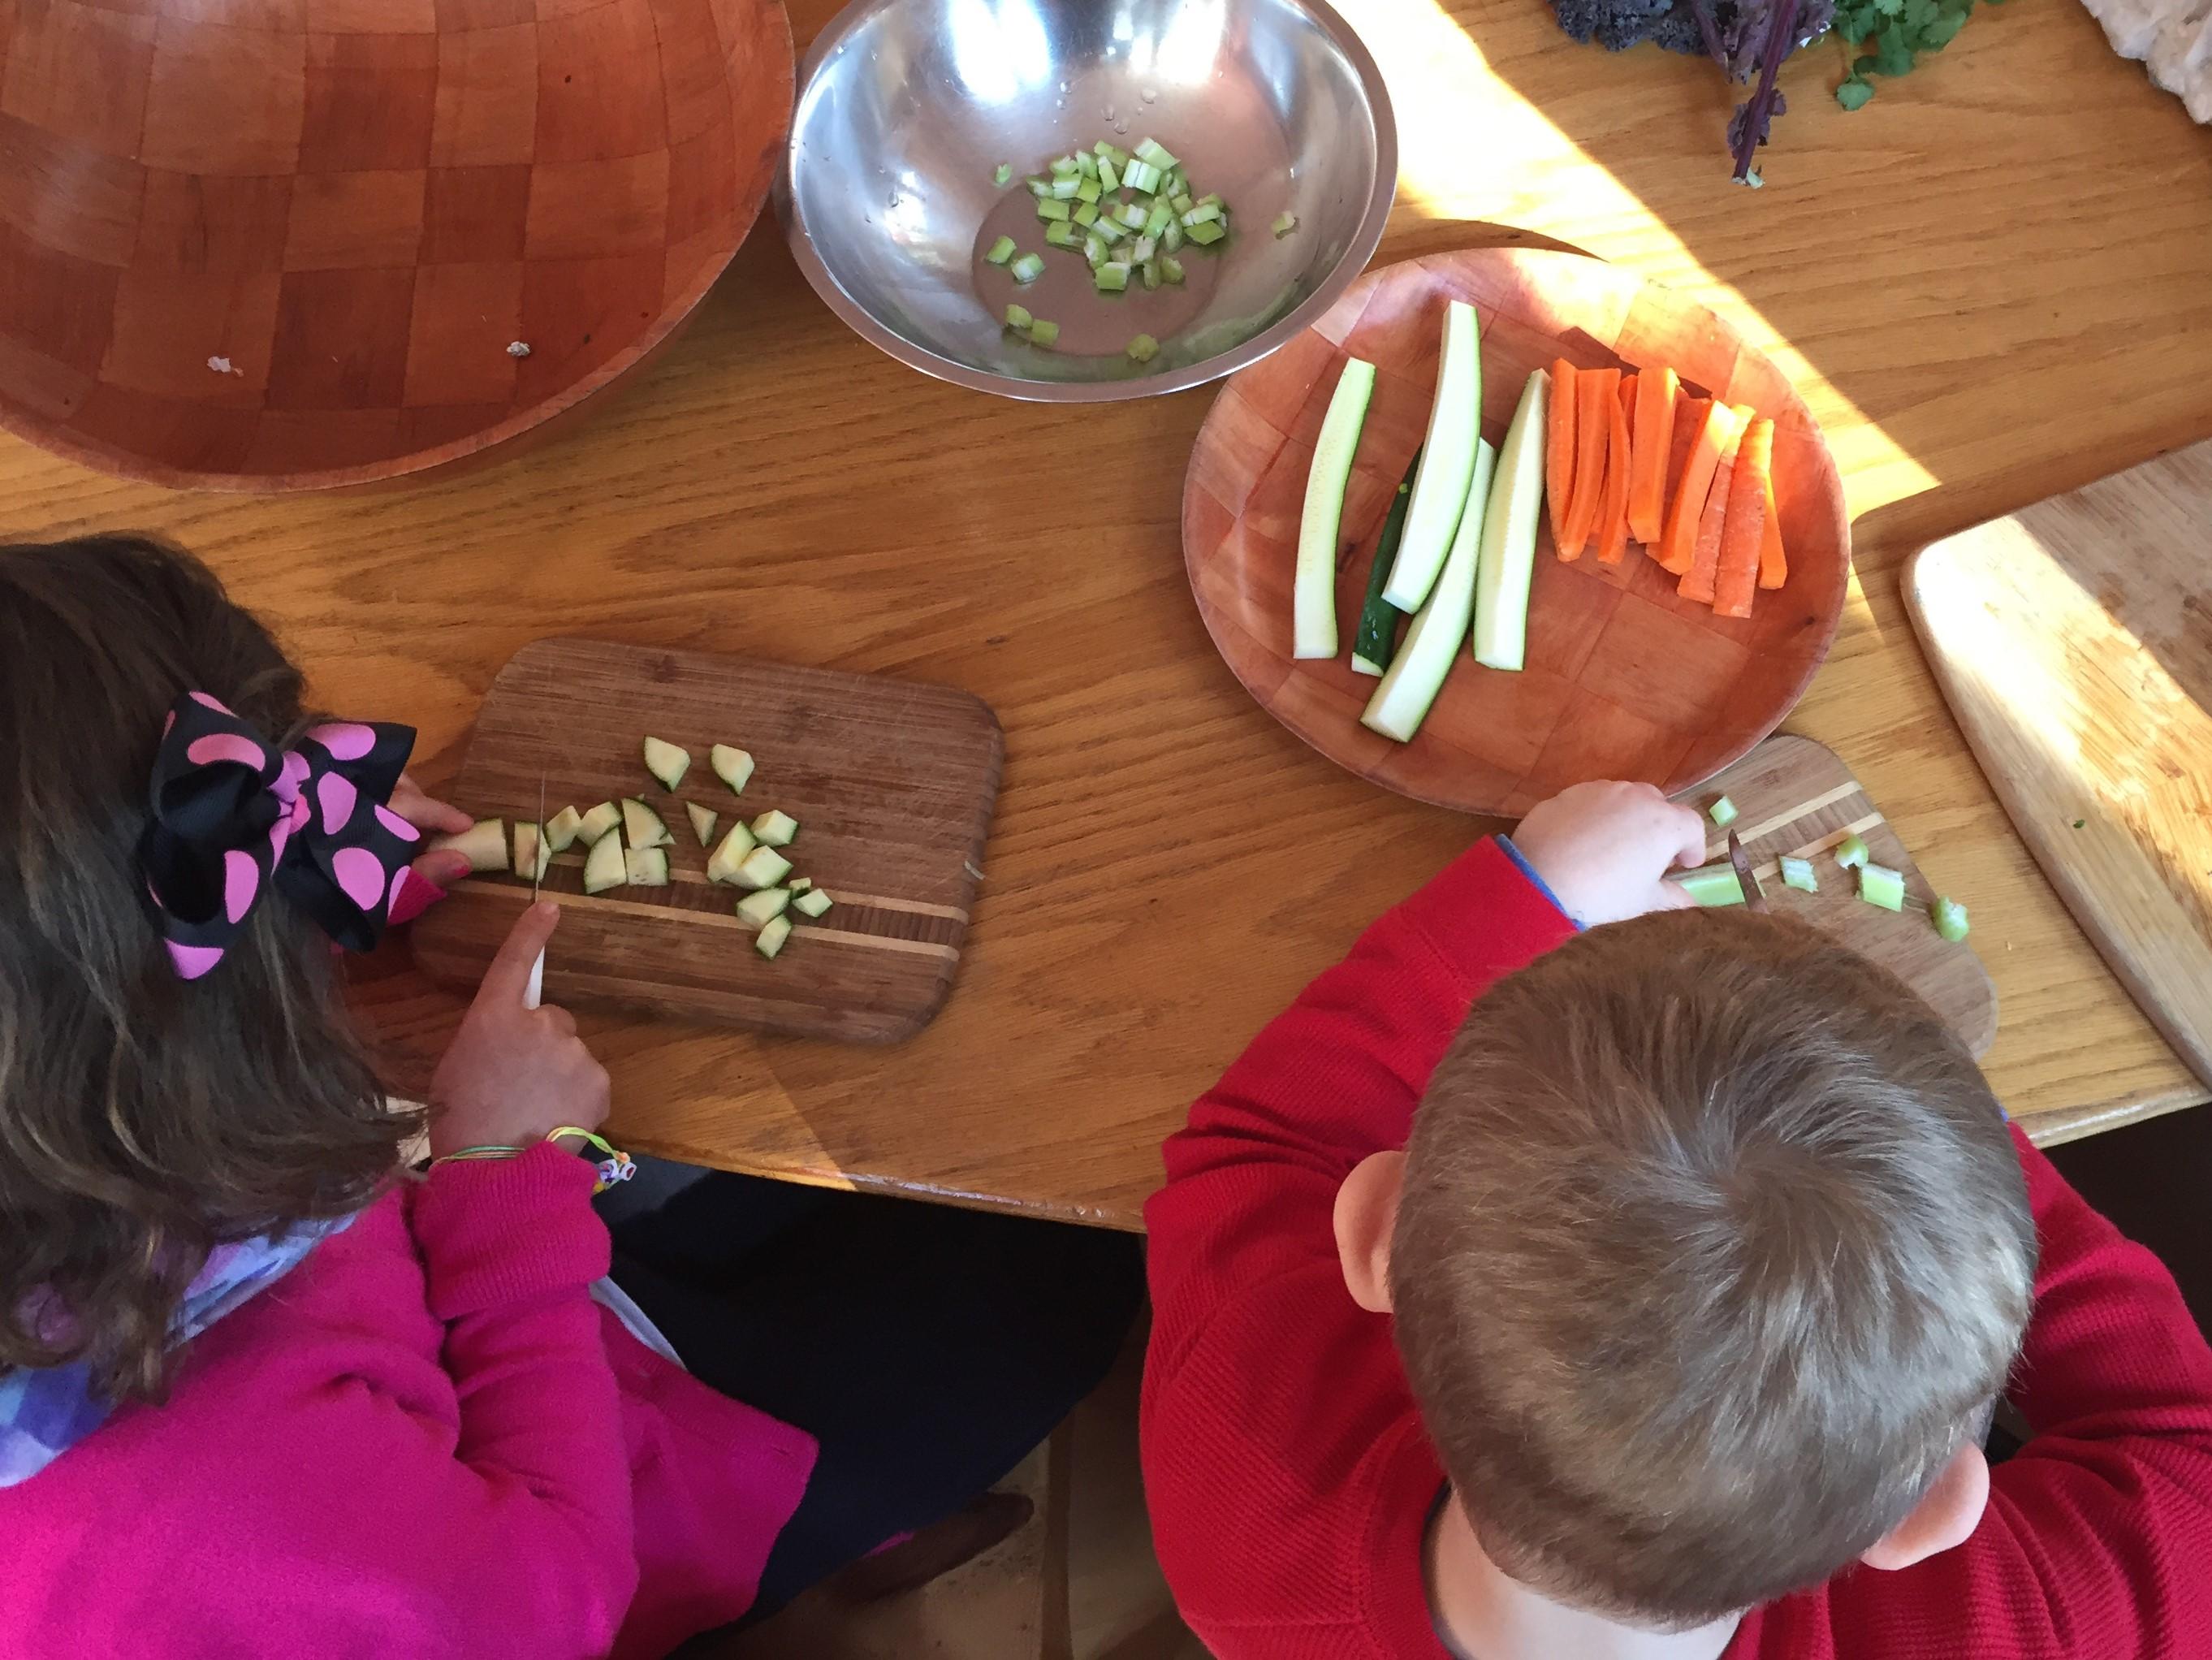 In our kindergarten program children help prepare daily meals.